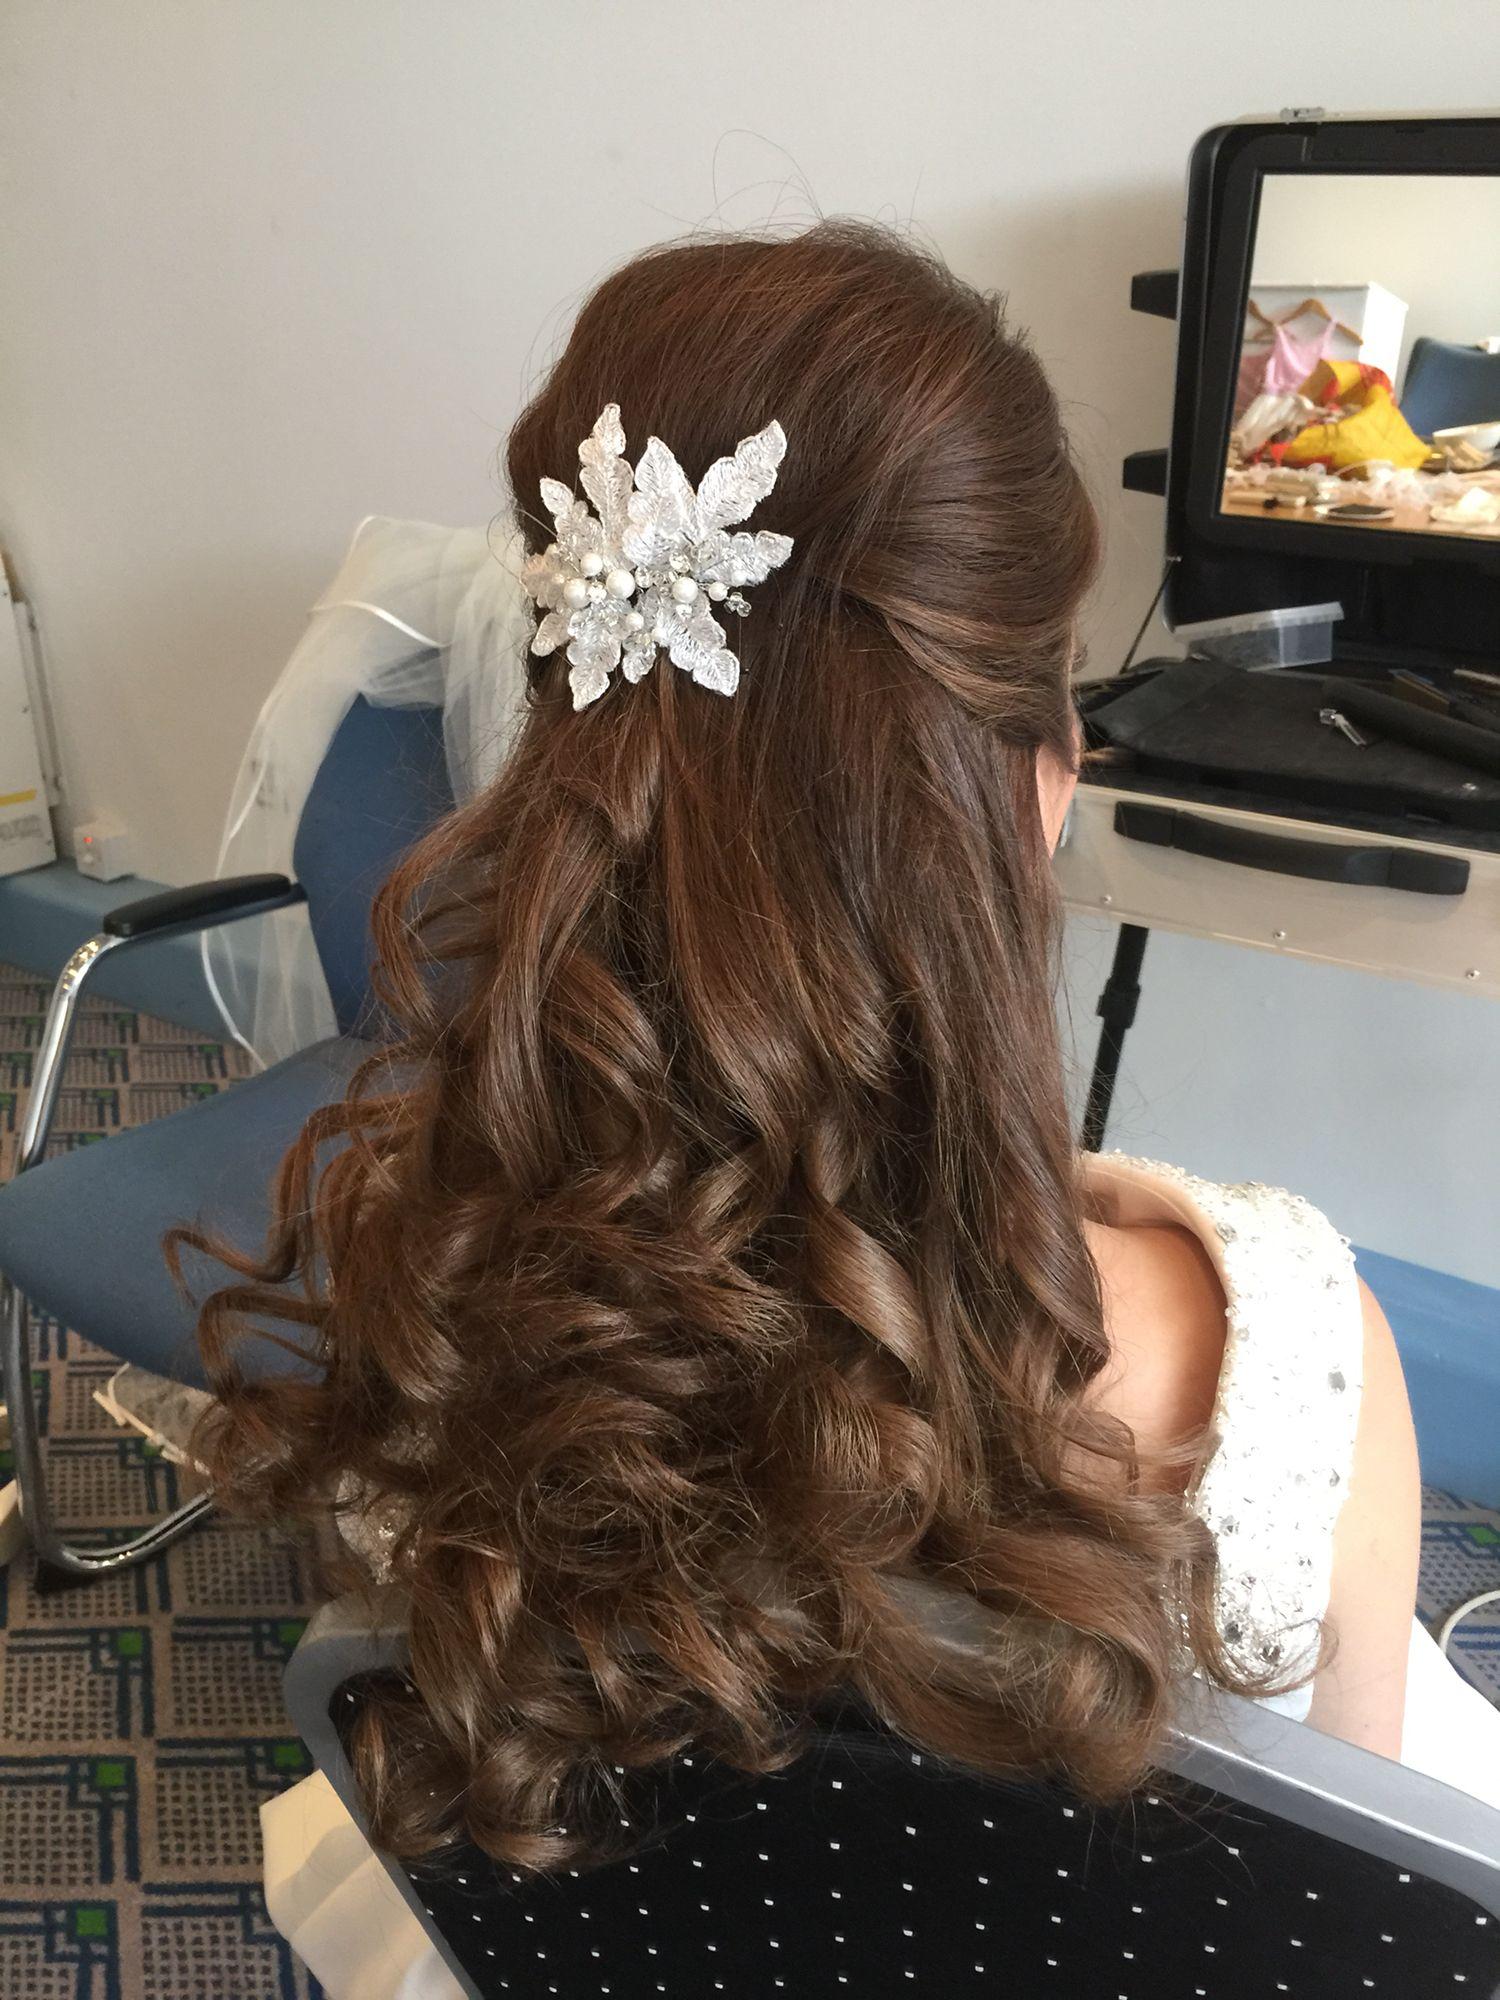 Pin by Annette Bradford on Long hair styles for weddings Pinterest